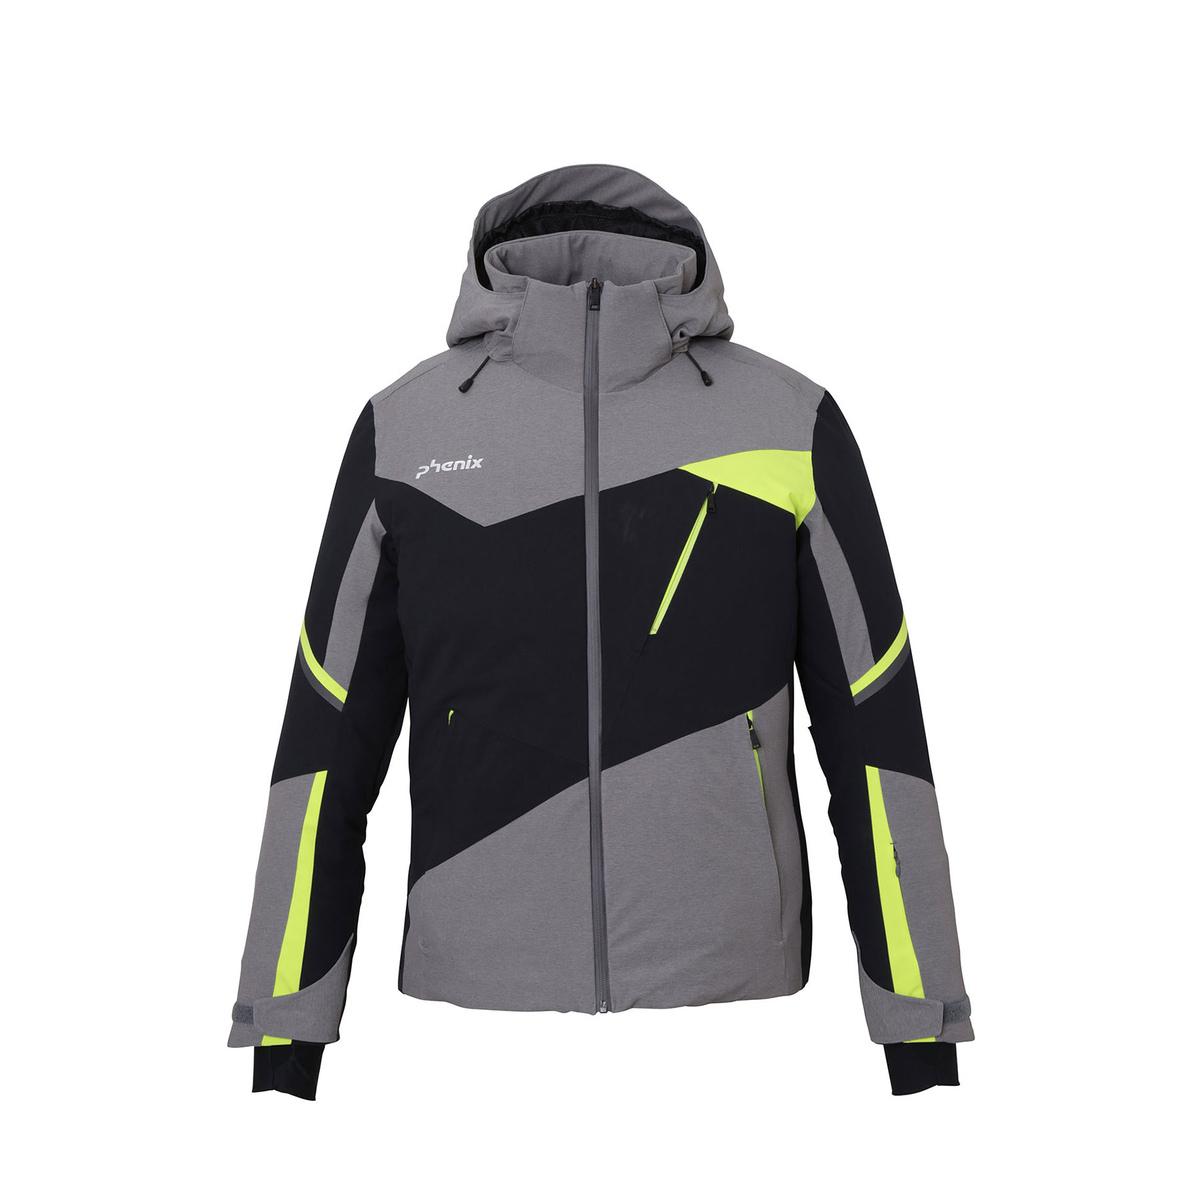 Prezzi Phenix completo giacca PRISM + salopette ARROW SLIM